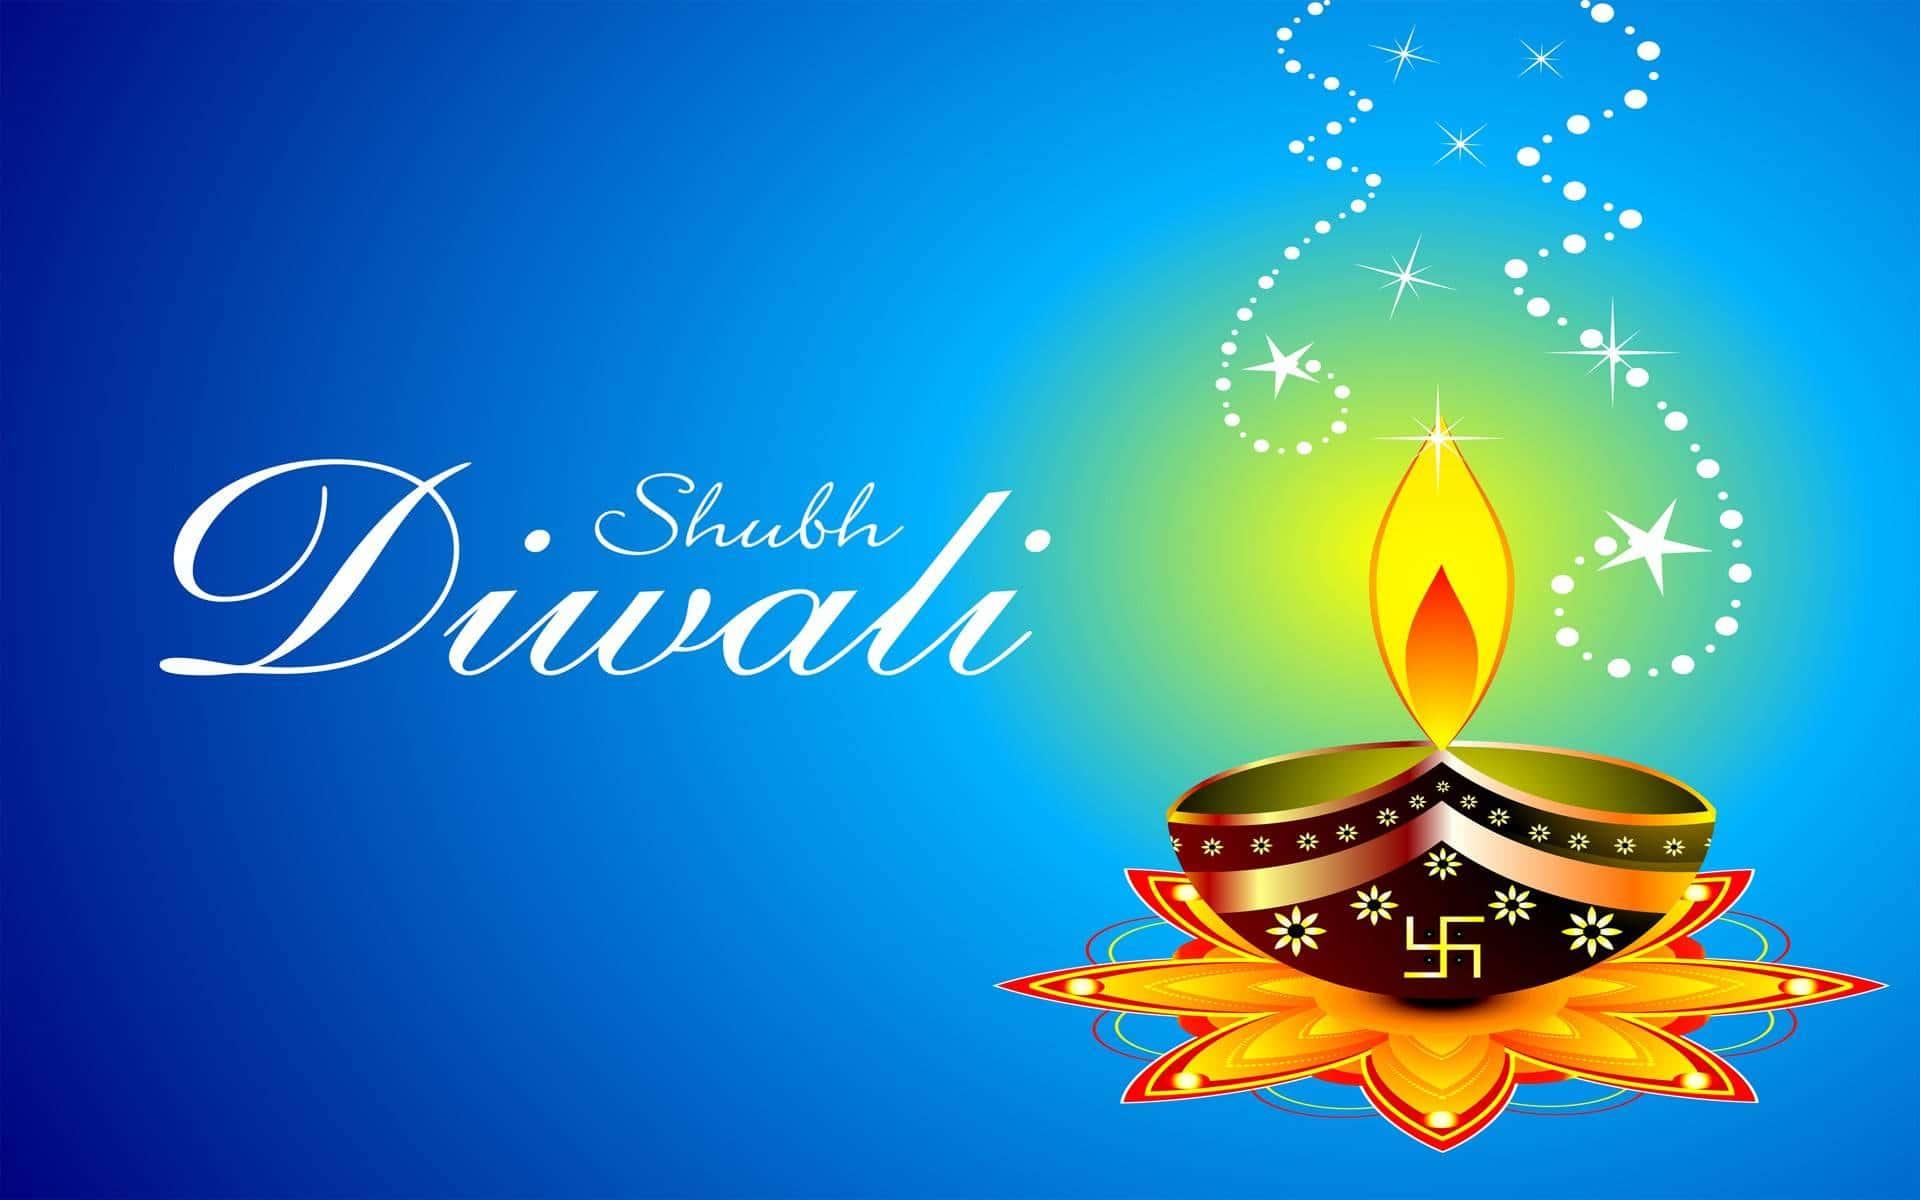 Shubh Deepavali Images for Whatsapp